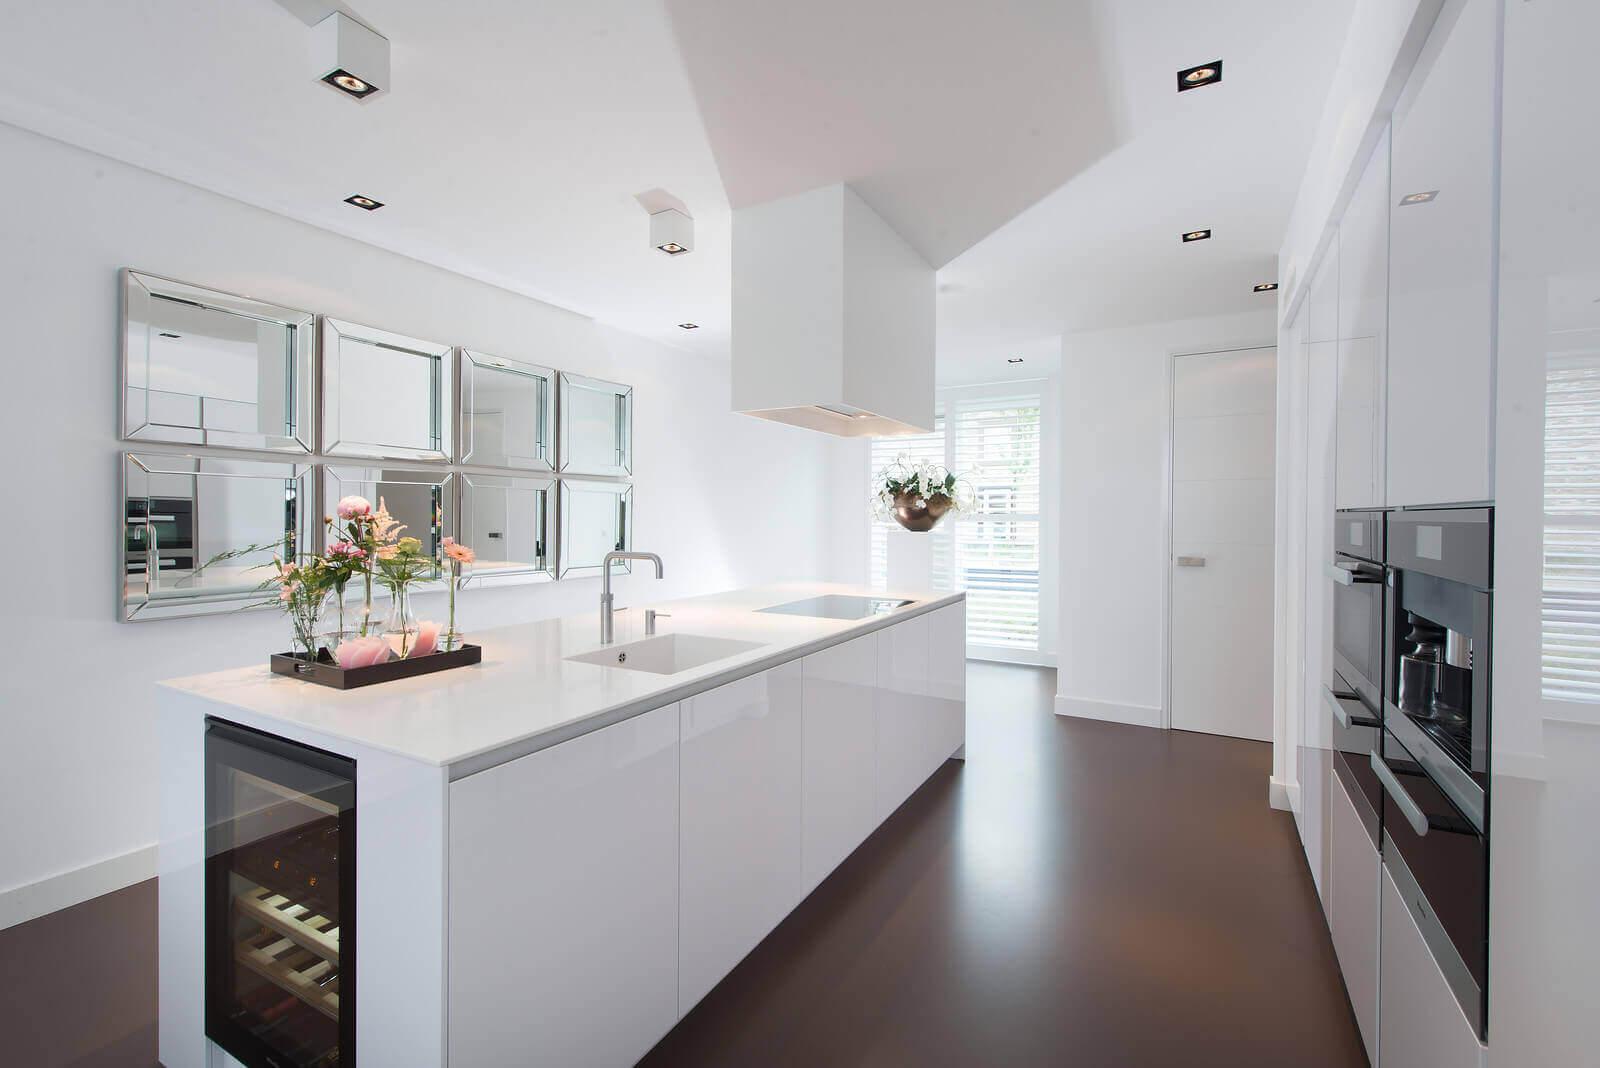 Keukenkastje van Tieleman Keukens